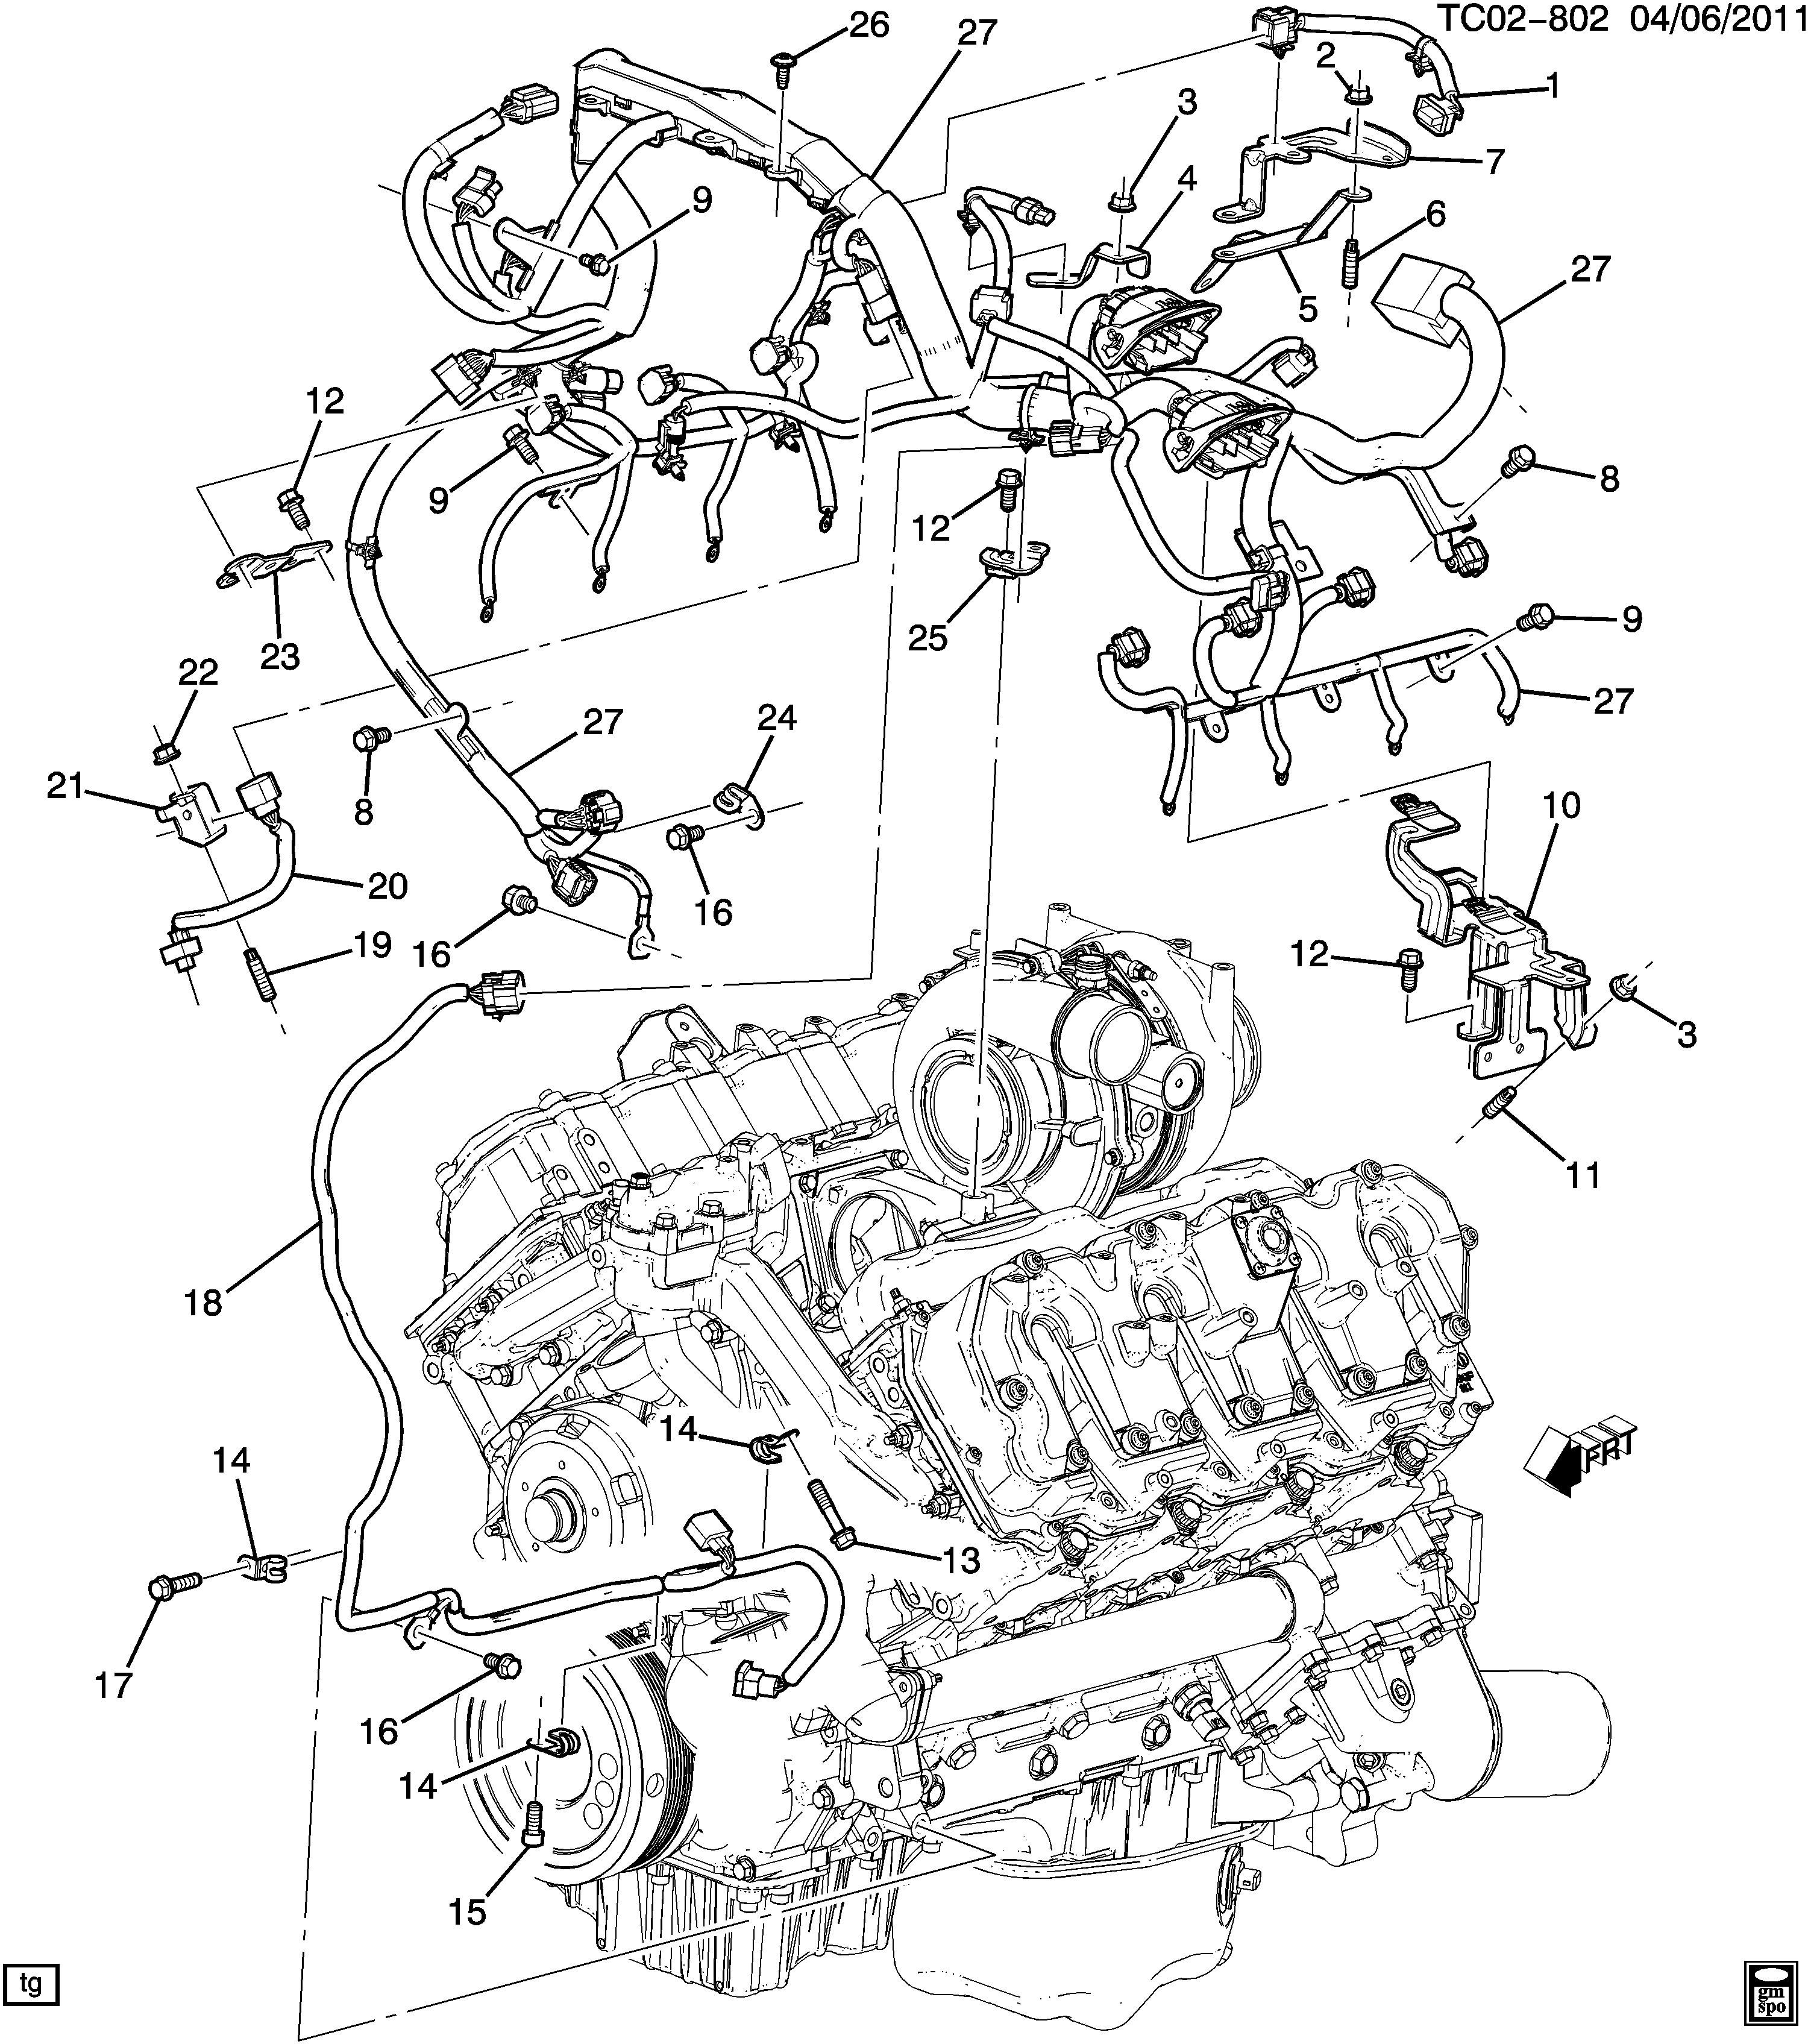 lb7 duramax engine diagram 2002 chevy duramax glow plug